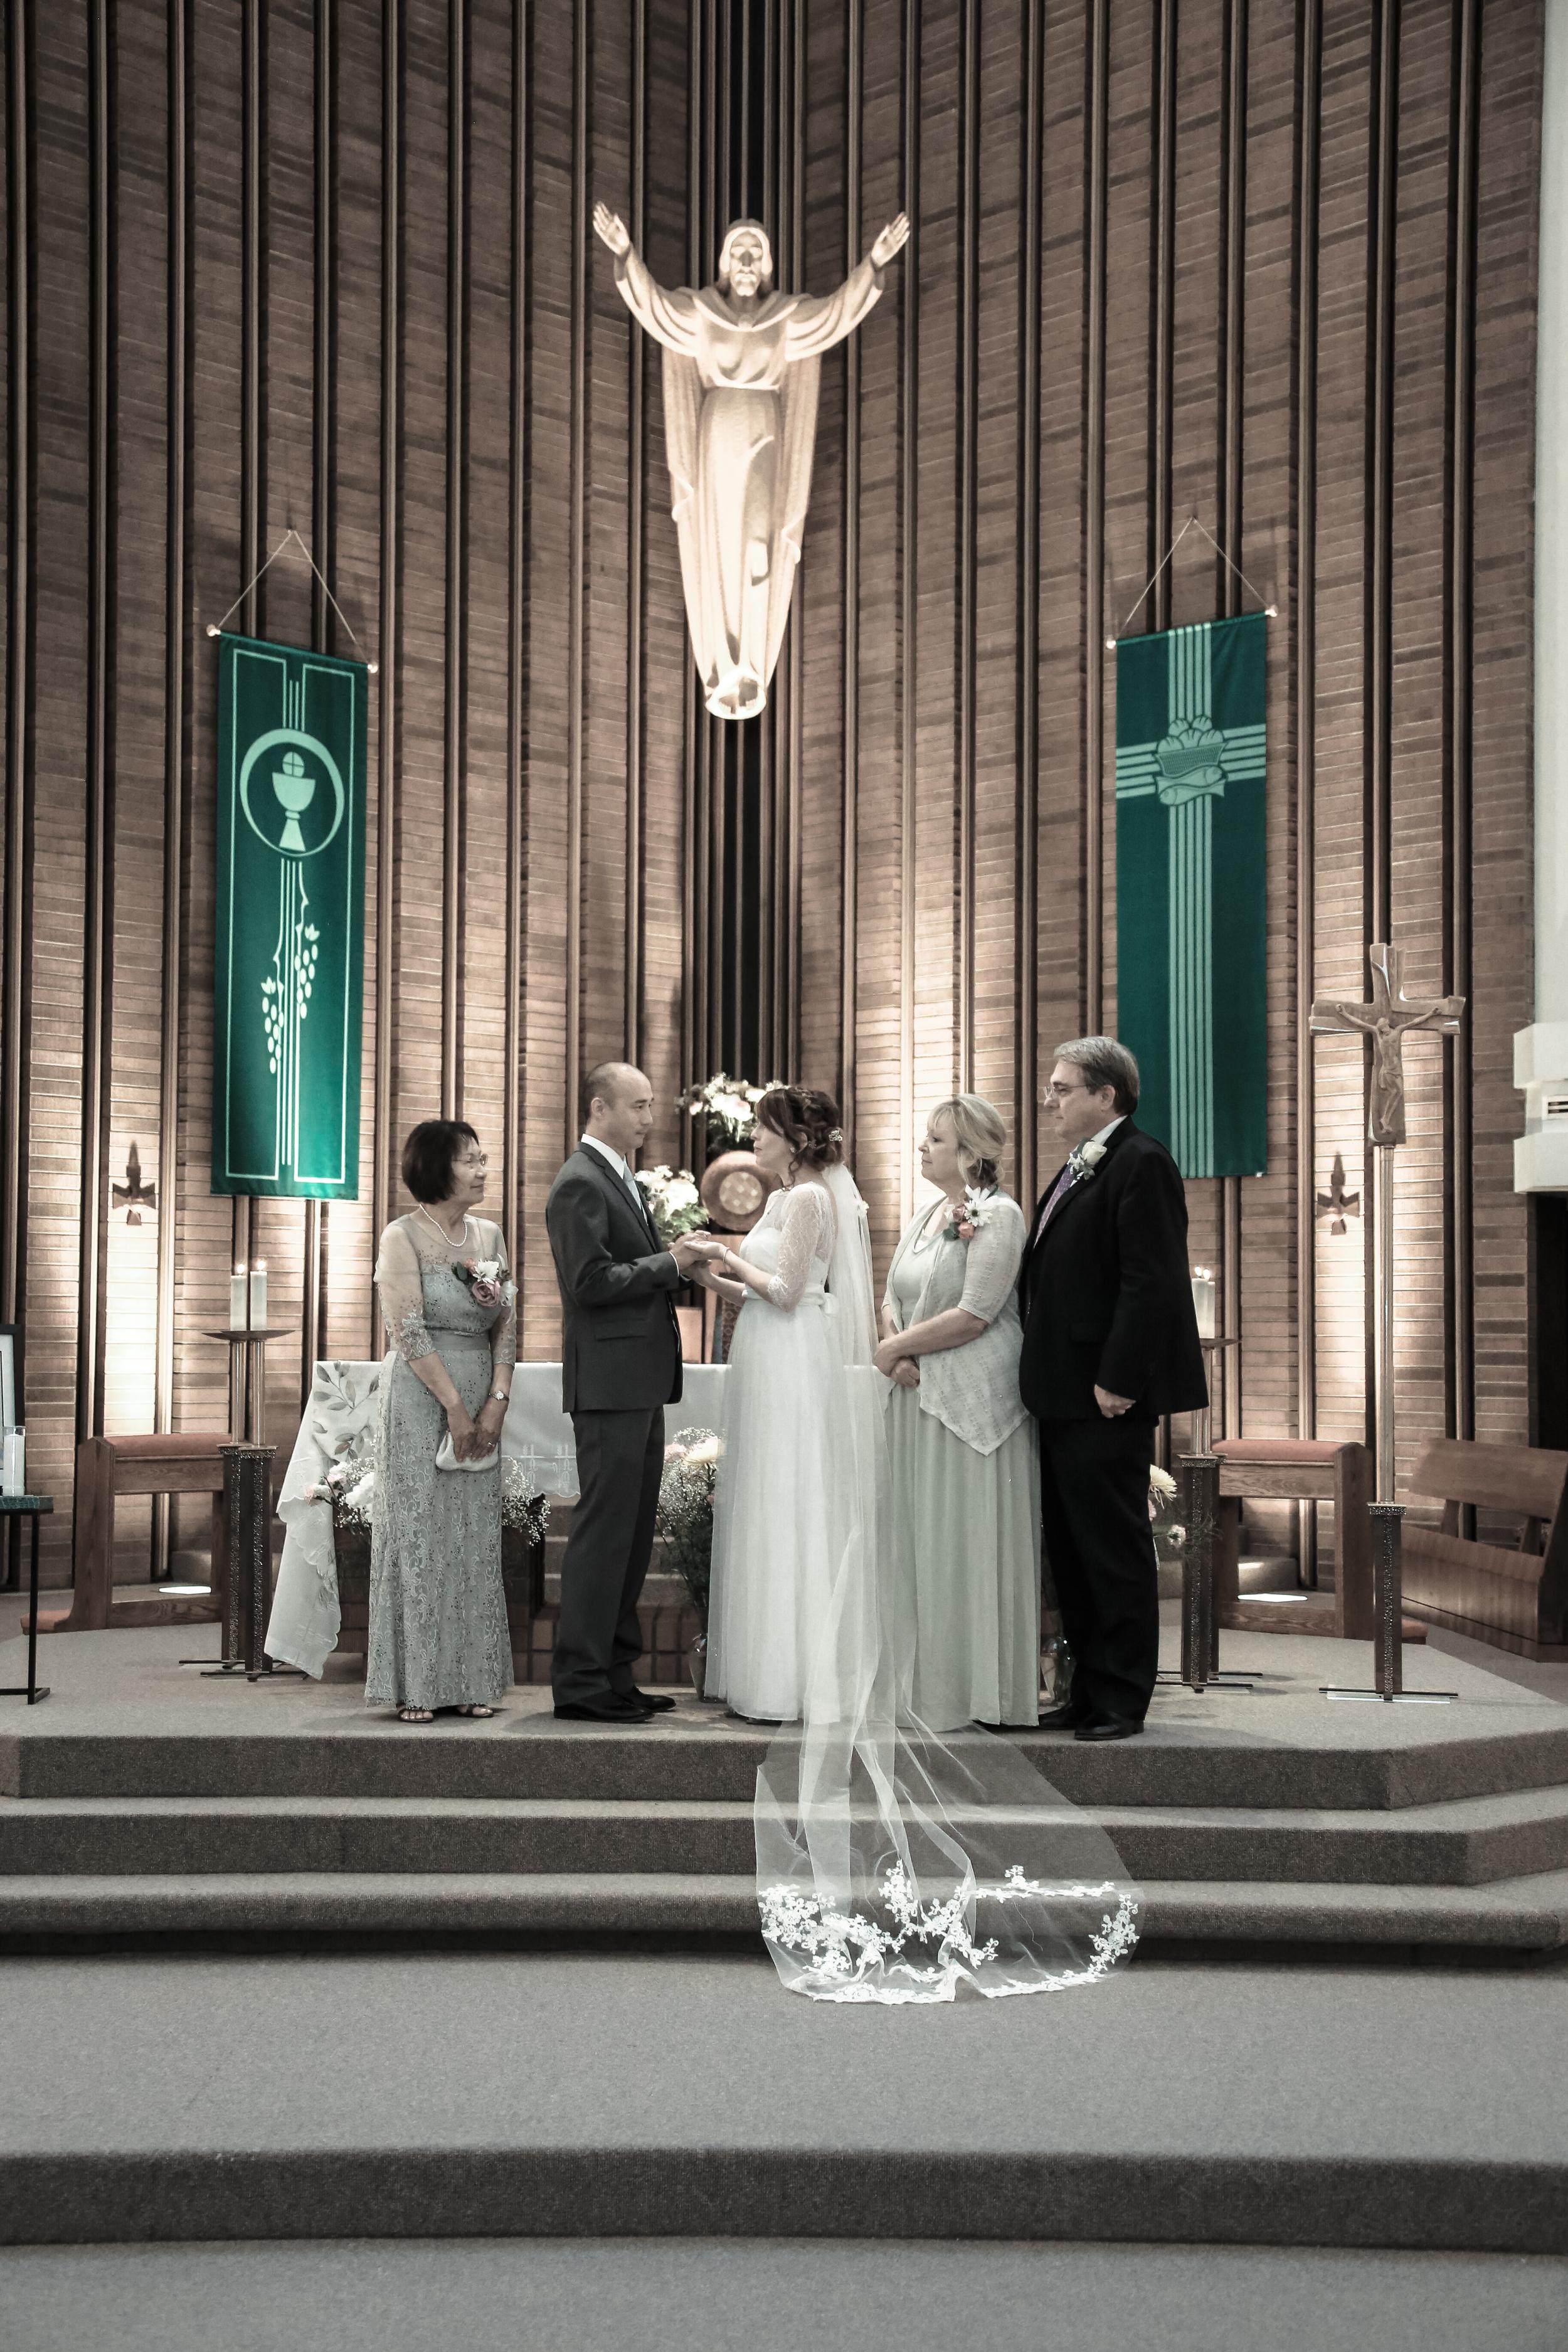 Salt Lake wedding ceremony photography